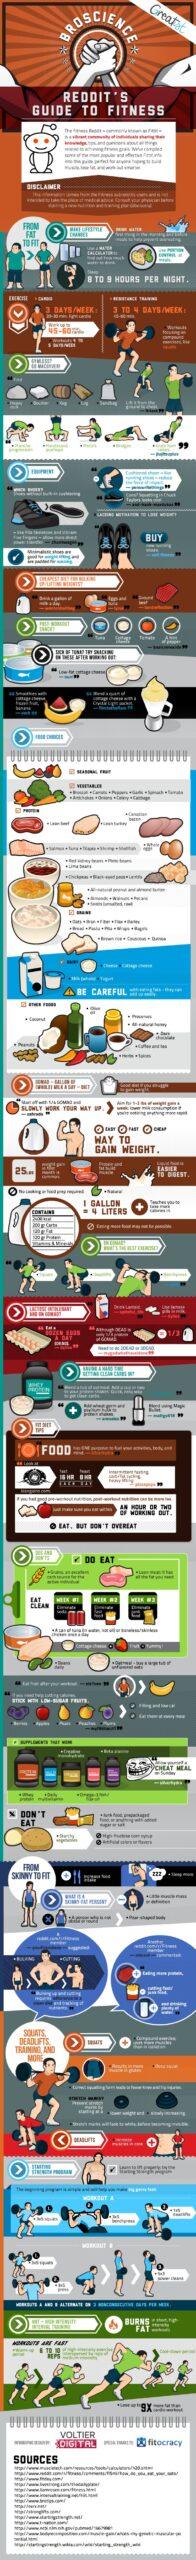 (Infografía) Guía de Fitness de Reddit 1